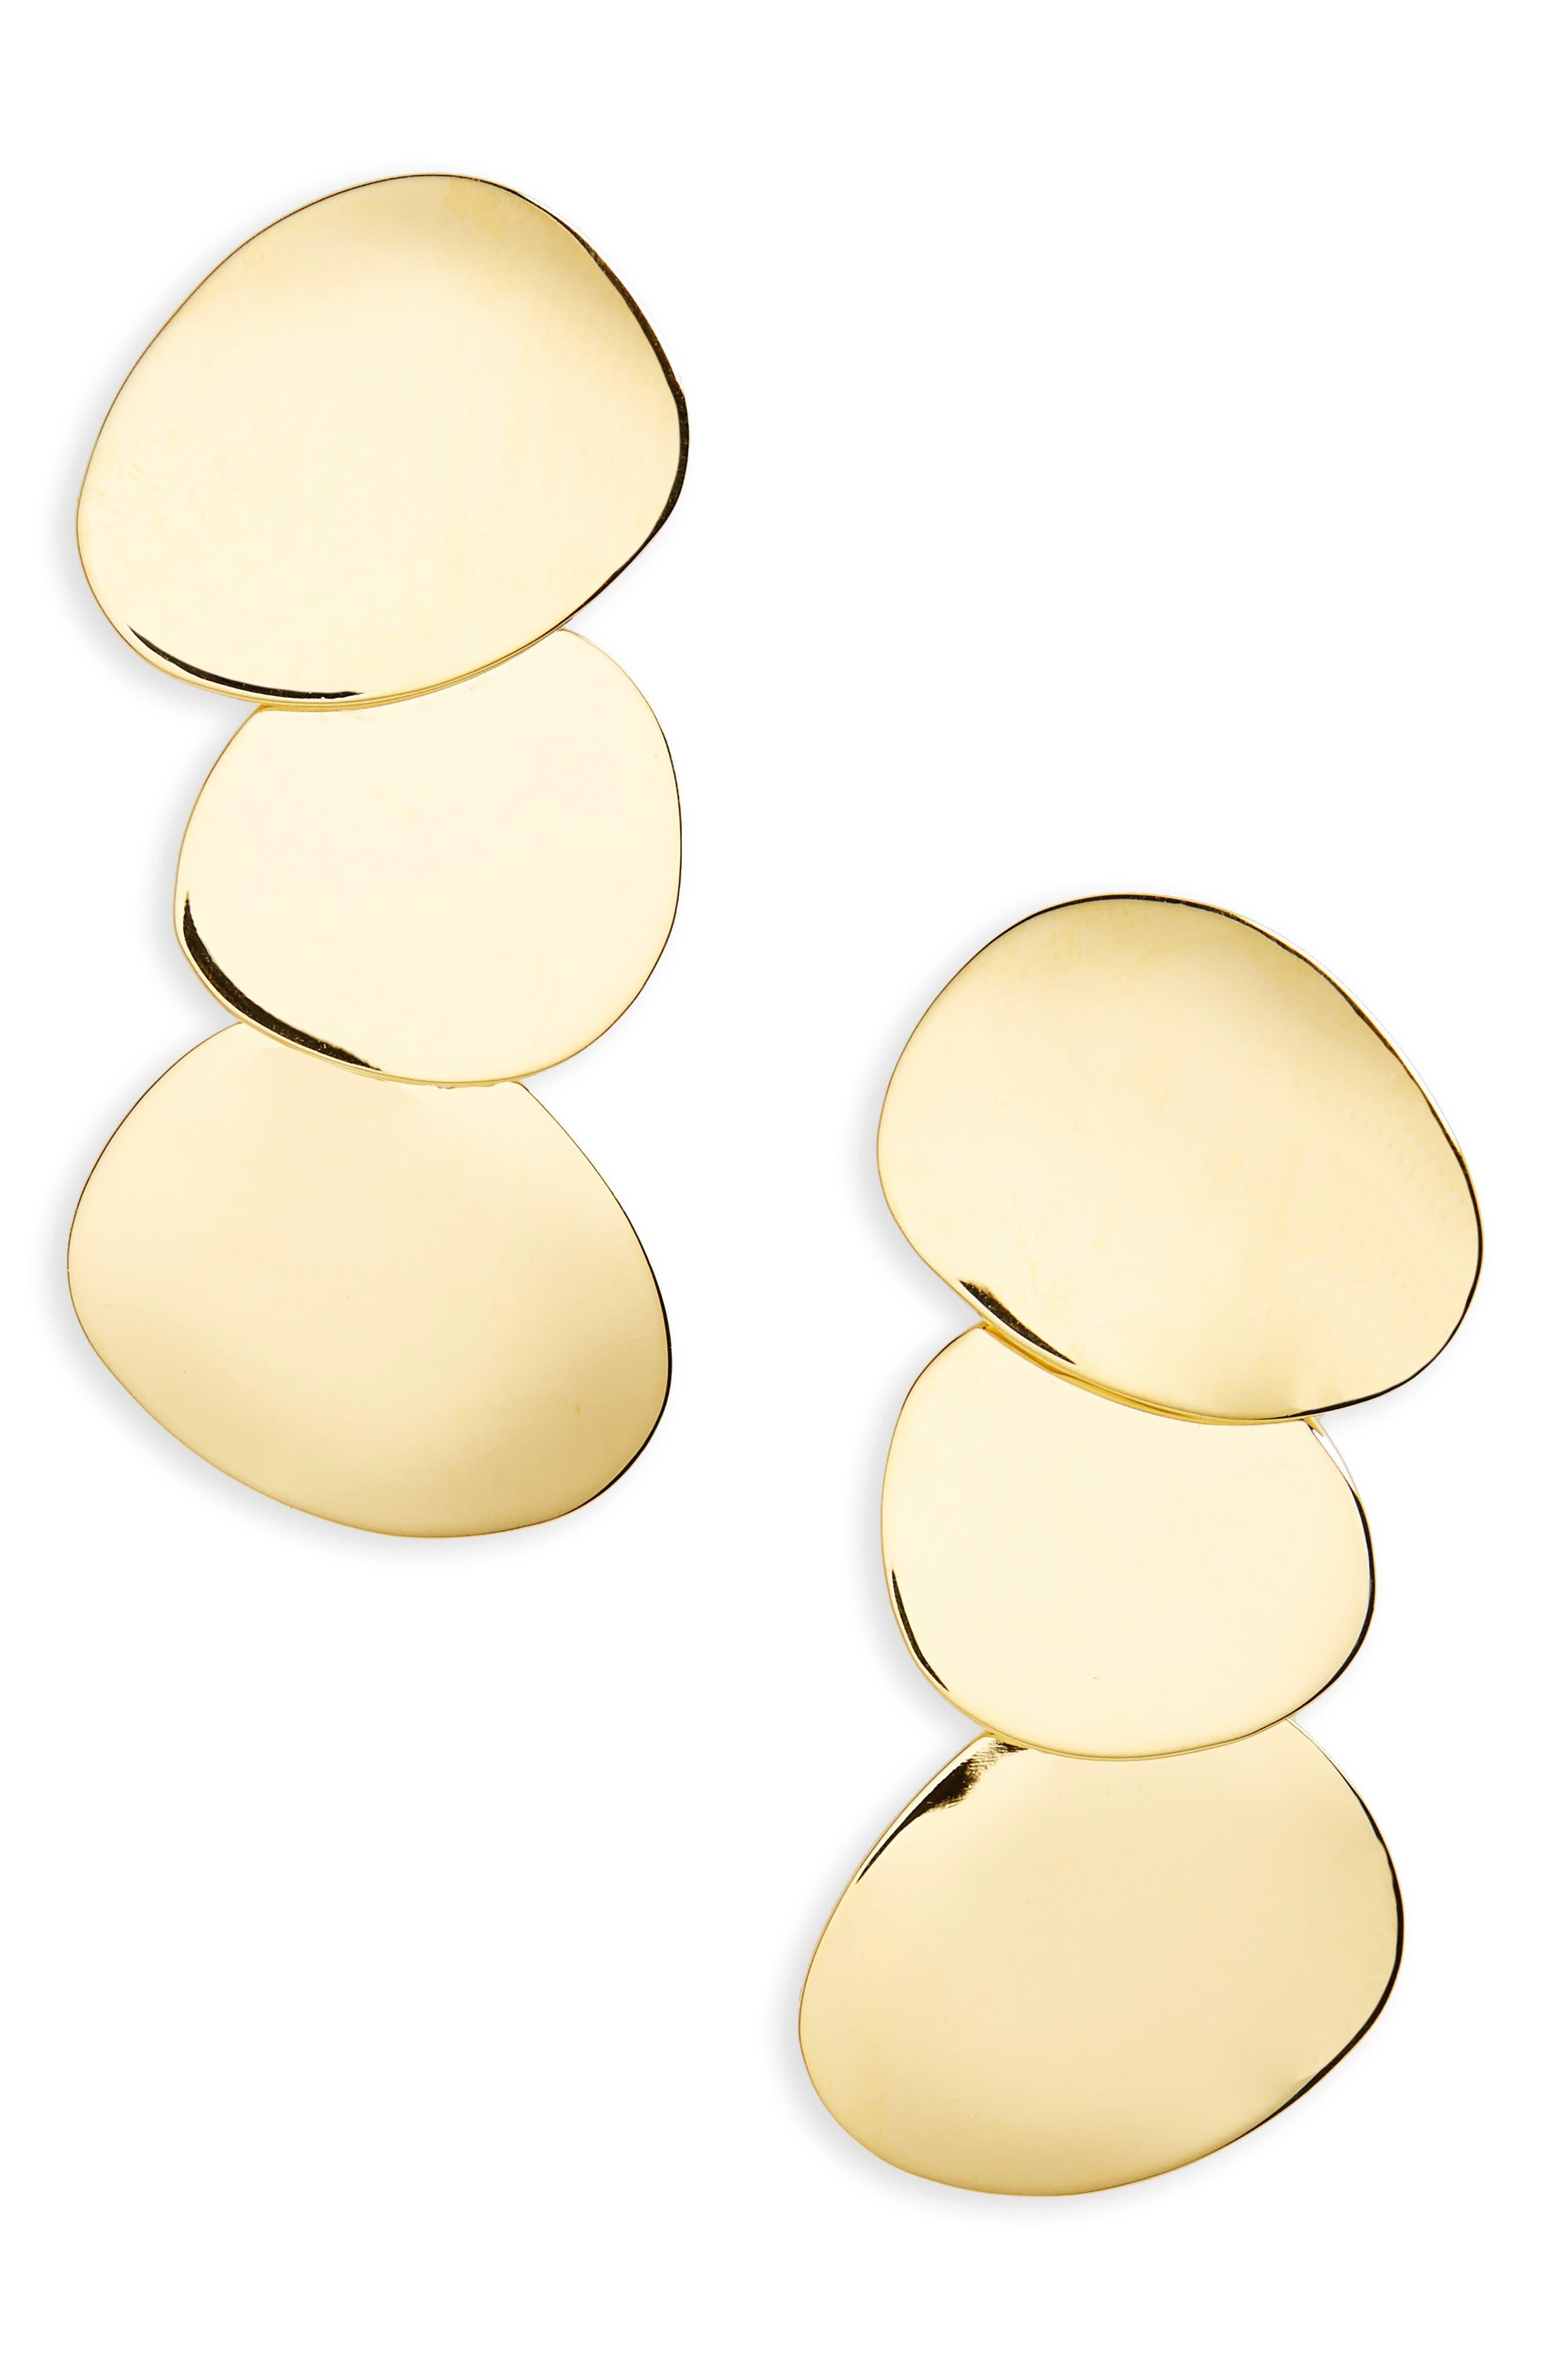 Goldworhty Drop Earrings,                             Main thumbnail 1, color,                             710